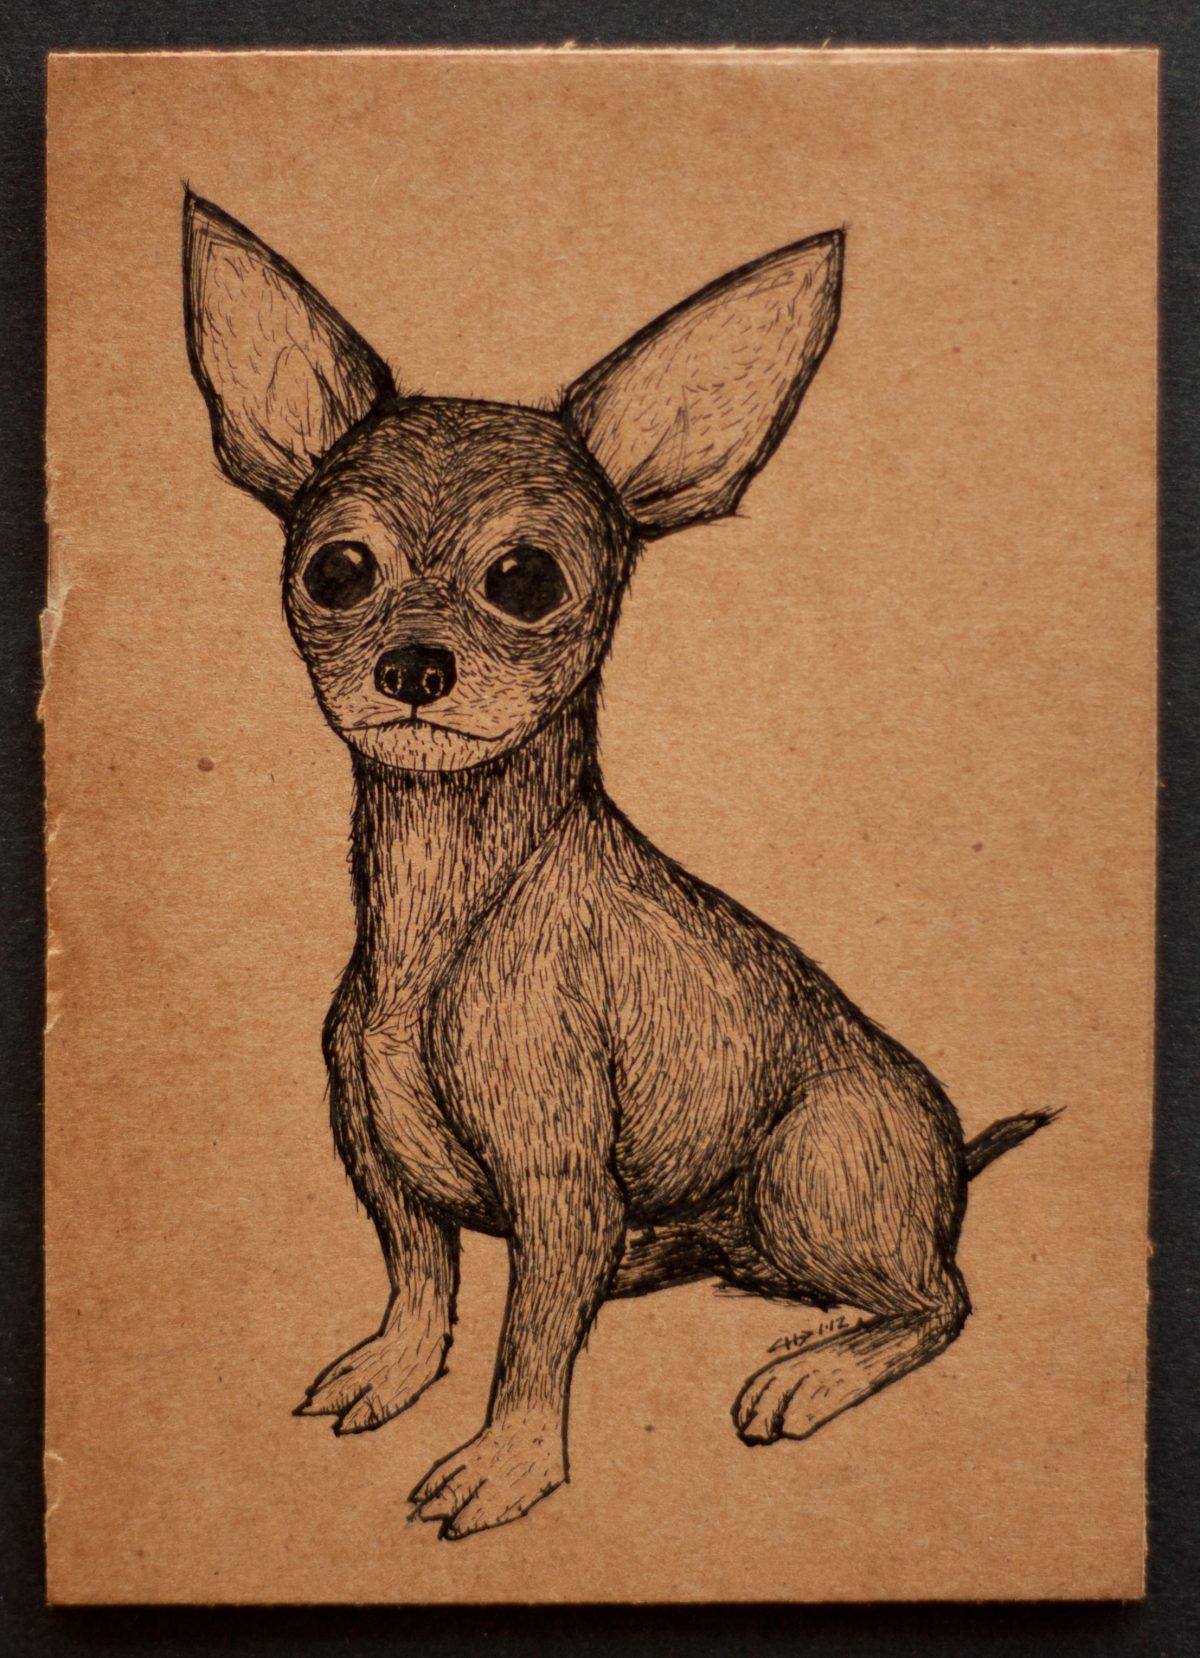 Chihuahua - 13x18cm, ink on cardboard, cardboard, ink, ch3